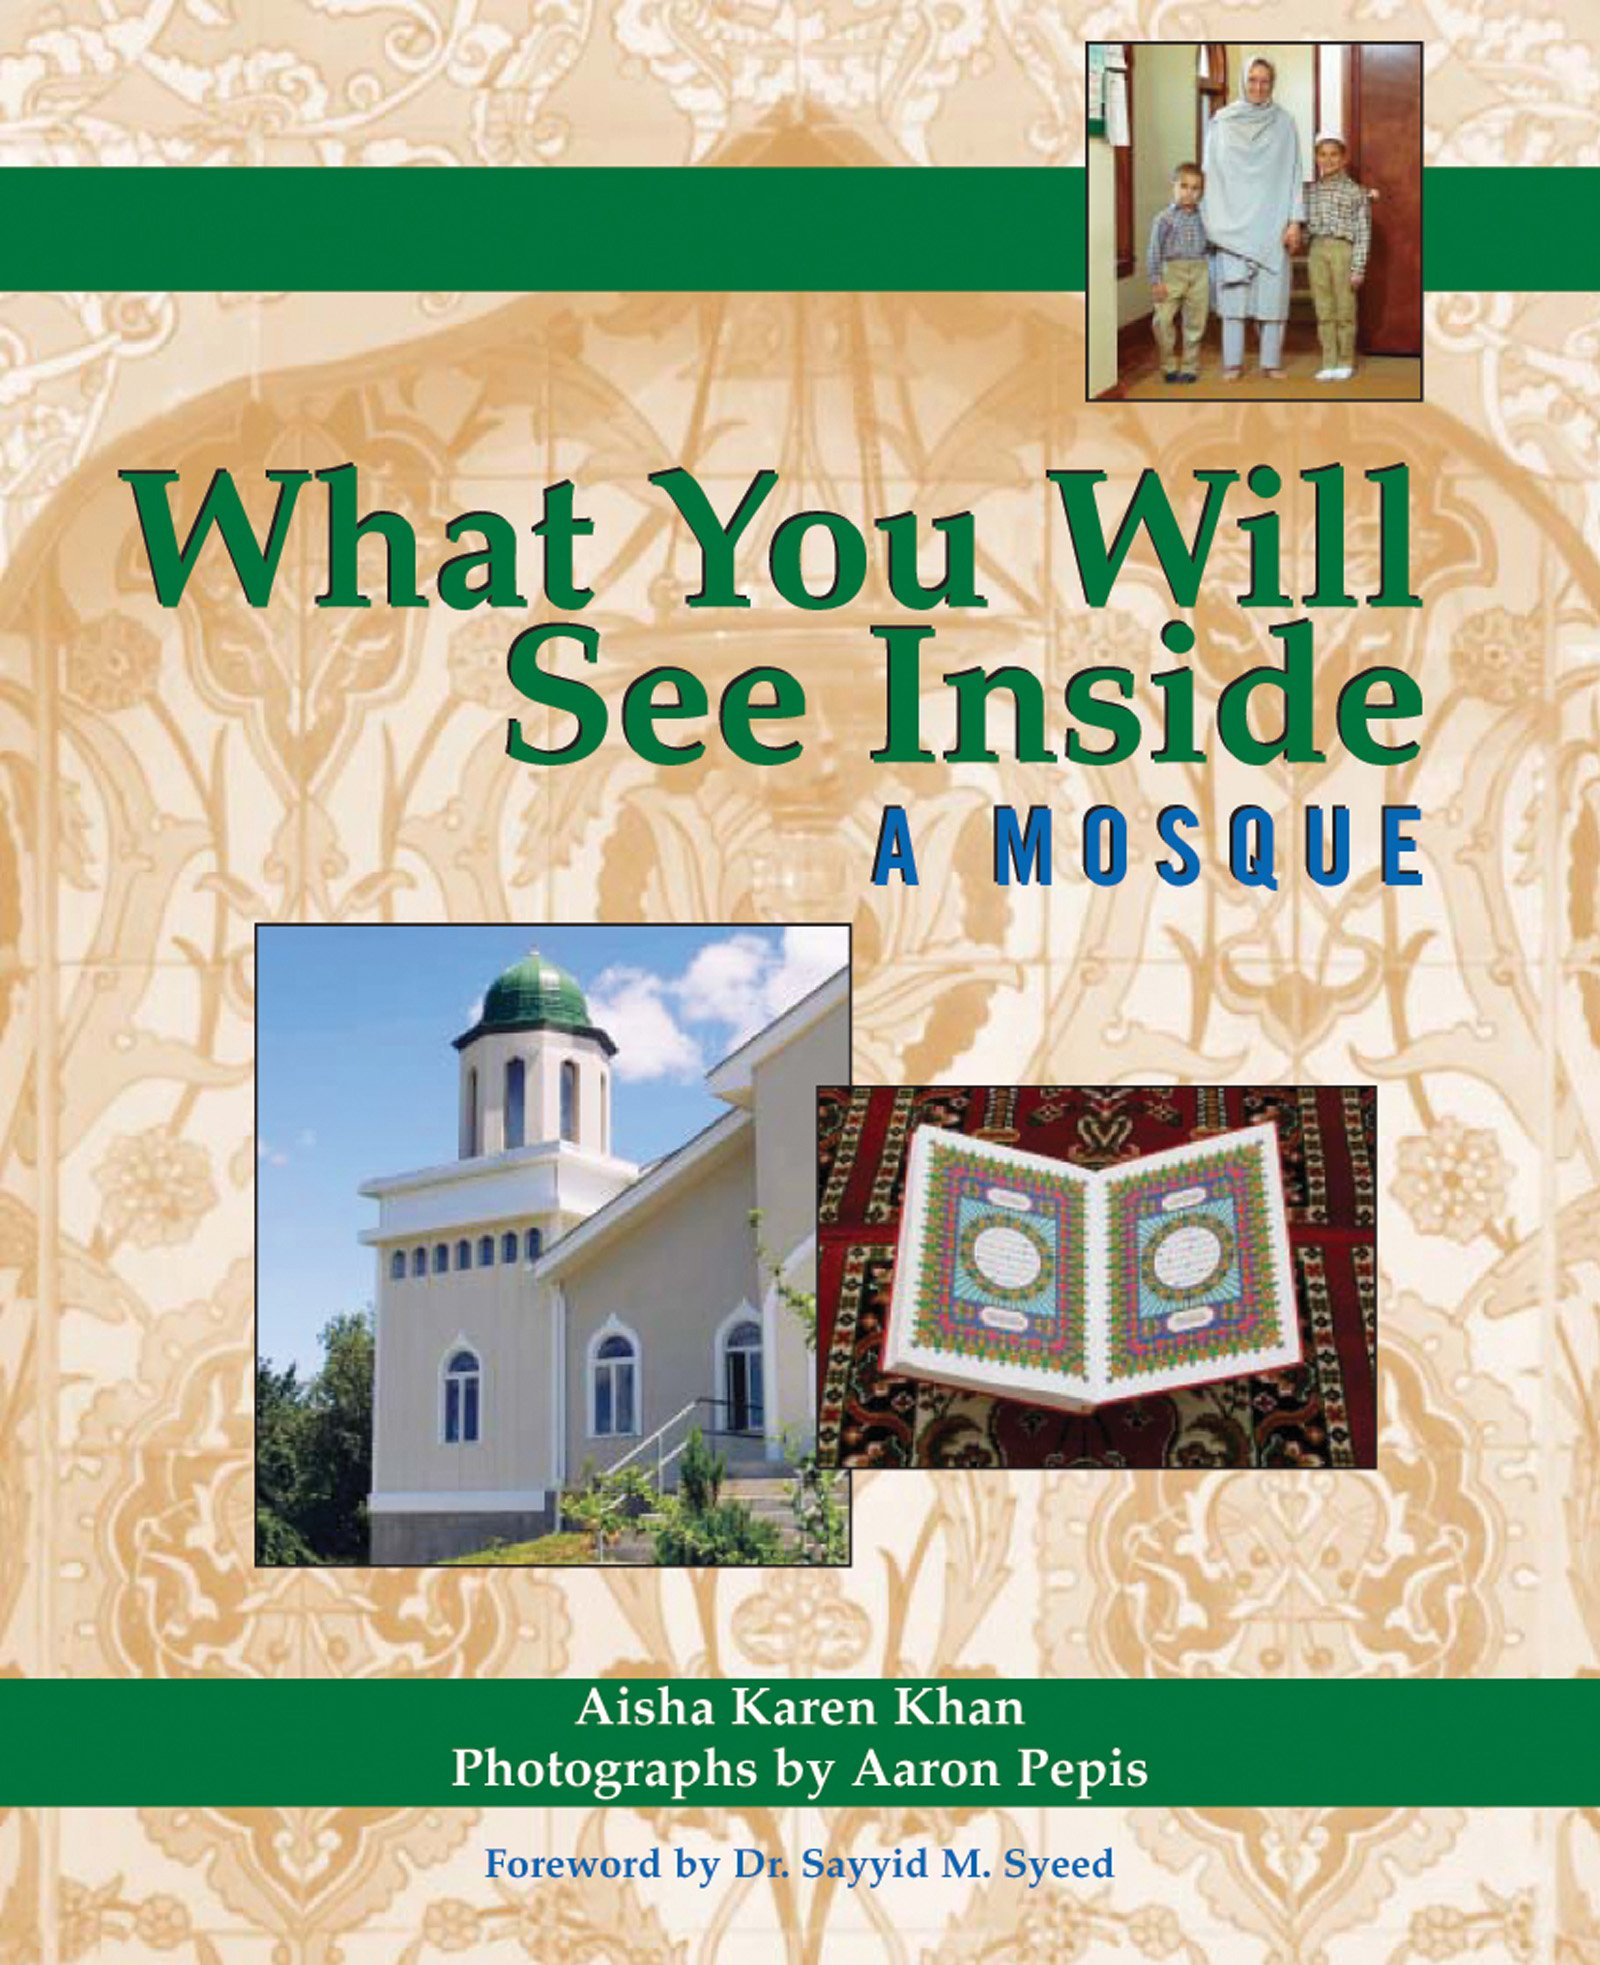 What You Will See Inside a Mosque por Aisha Karen Khan